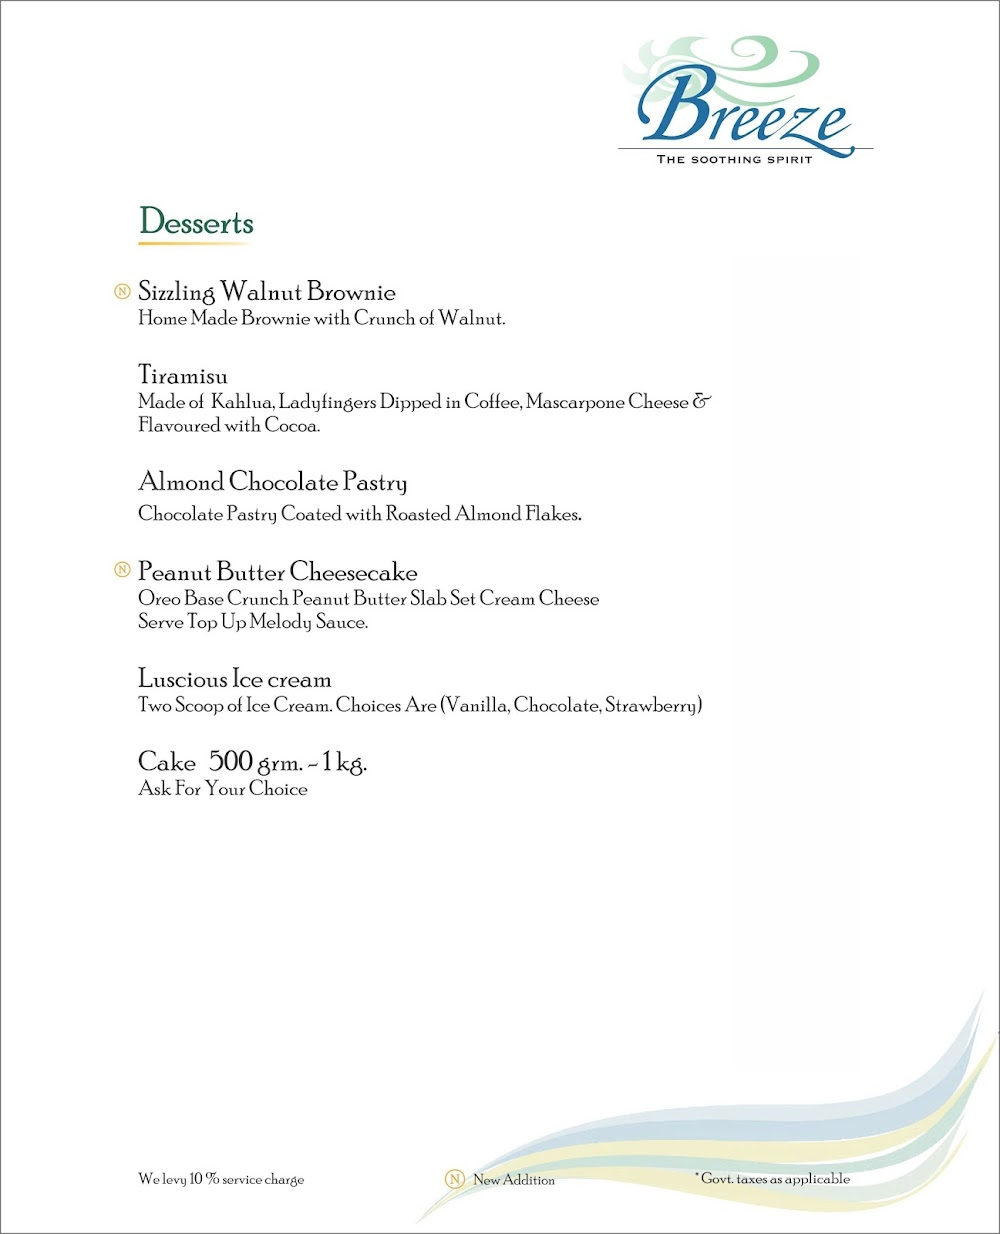 Breeze Lounge menu 2